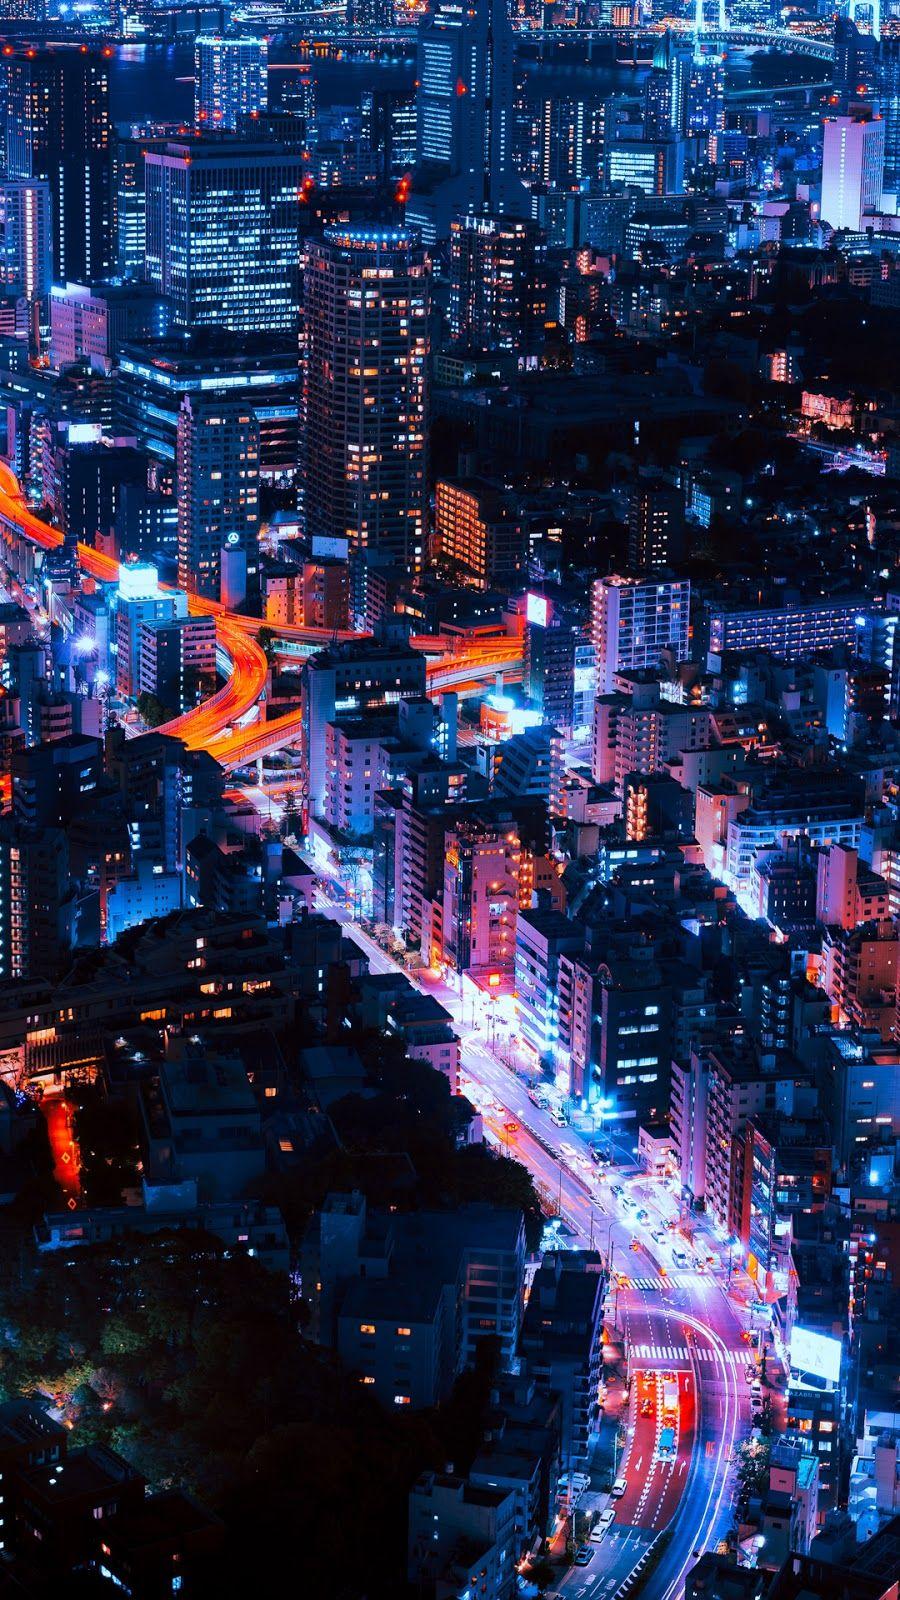 Tokyo night | Beautiful Wallpaper | Iphone wallpaper, S8 wallpaper, Hd wallpaper iphone